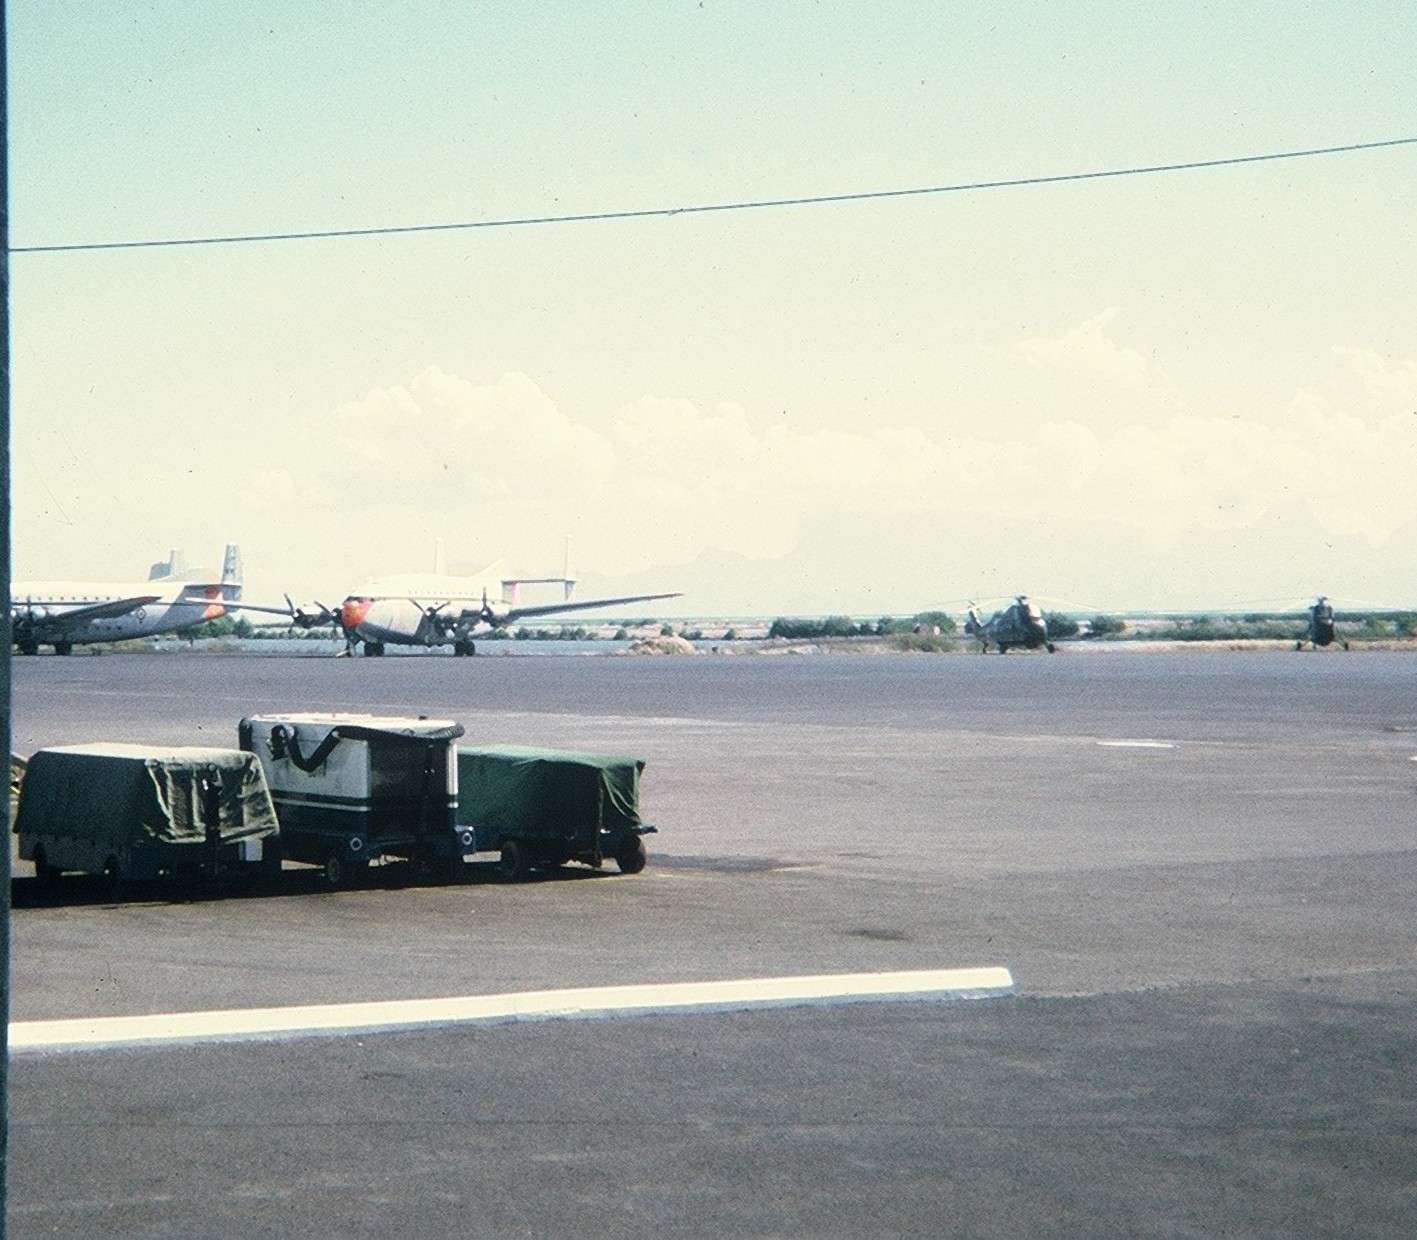 Tahiti] Aéroport Faa'a  durant les campagnes. Cd2_pa28